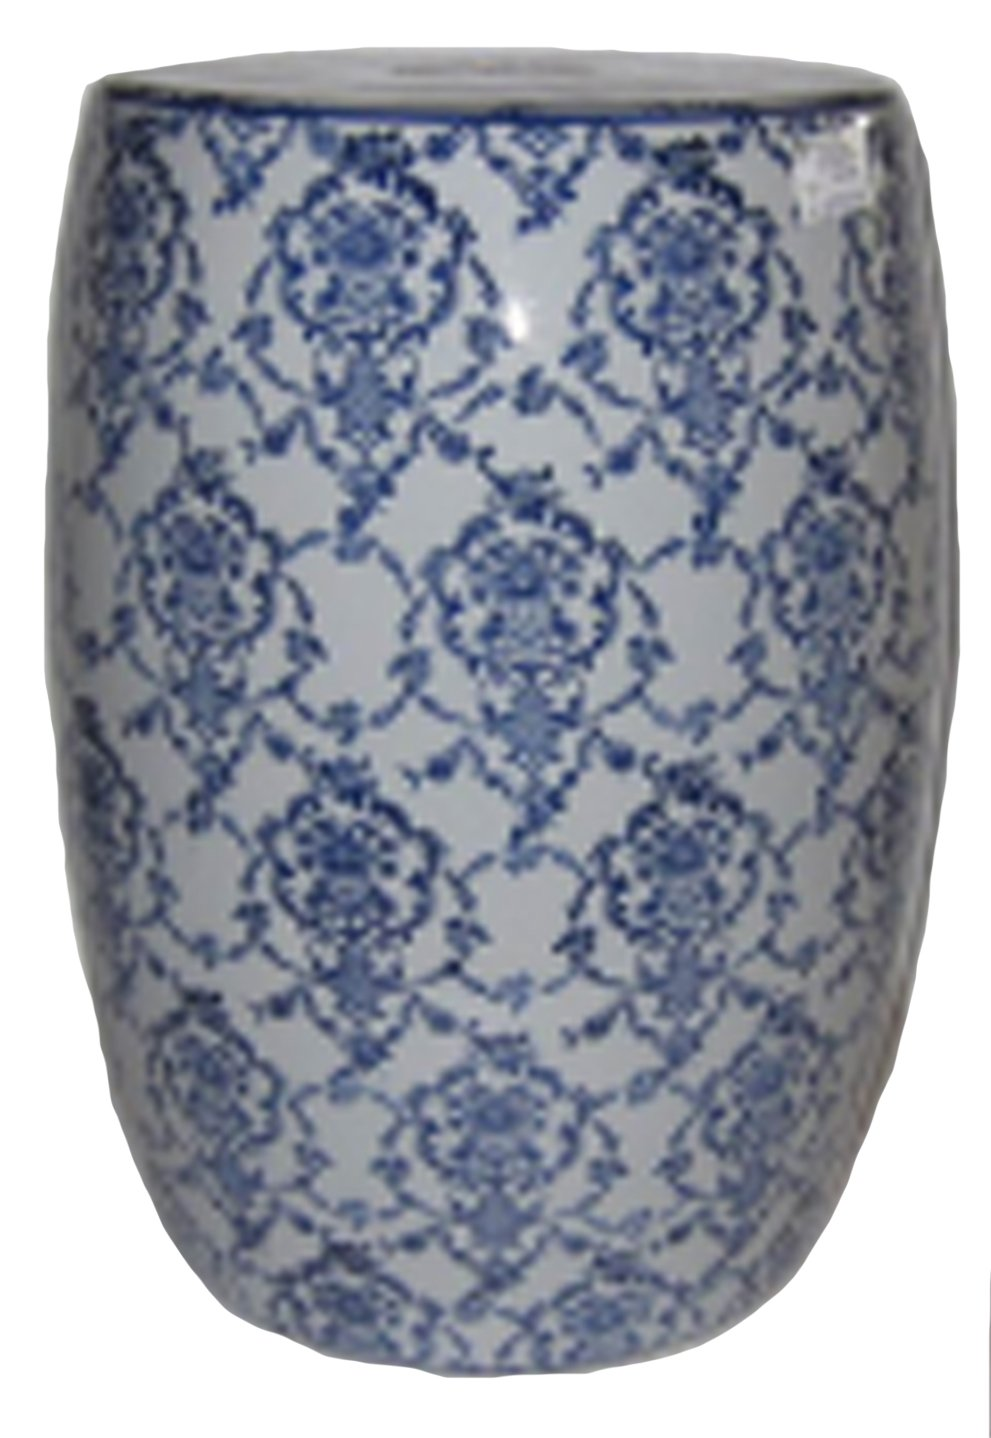 Sagebrook Home 11841 Ceramic Garden Stool, Blue/White Ceramic, 13 x 13 x 18 Inches